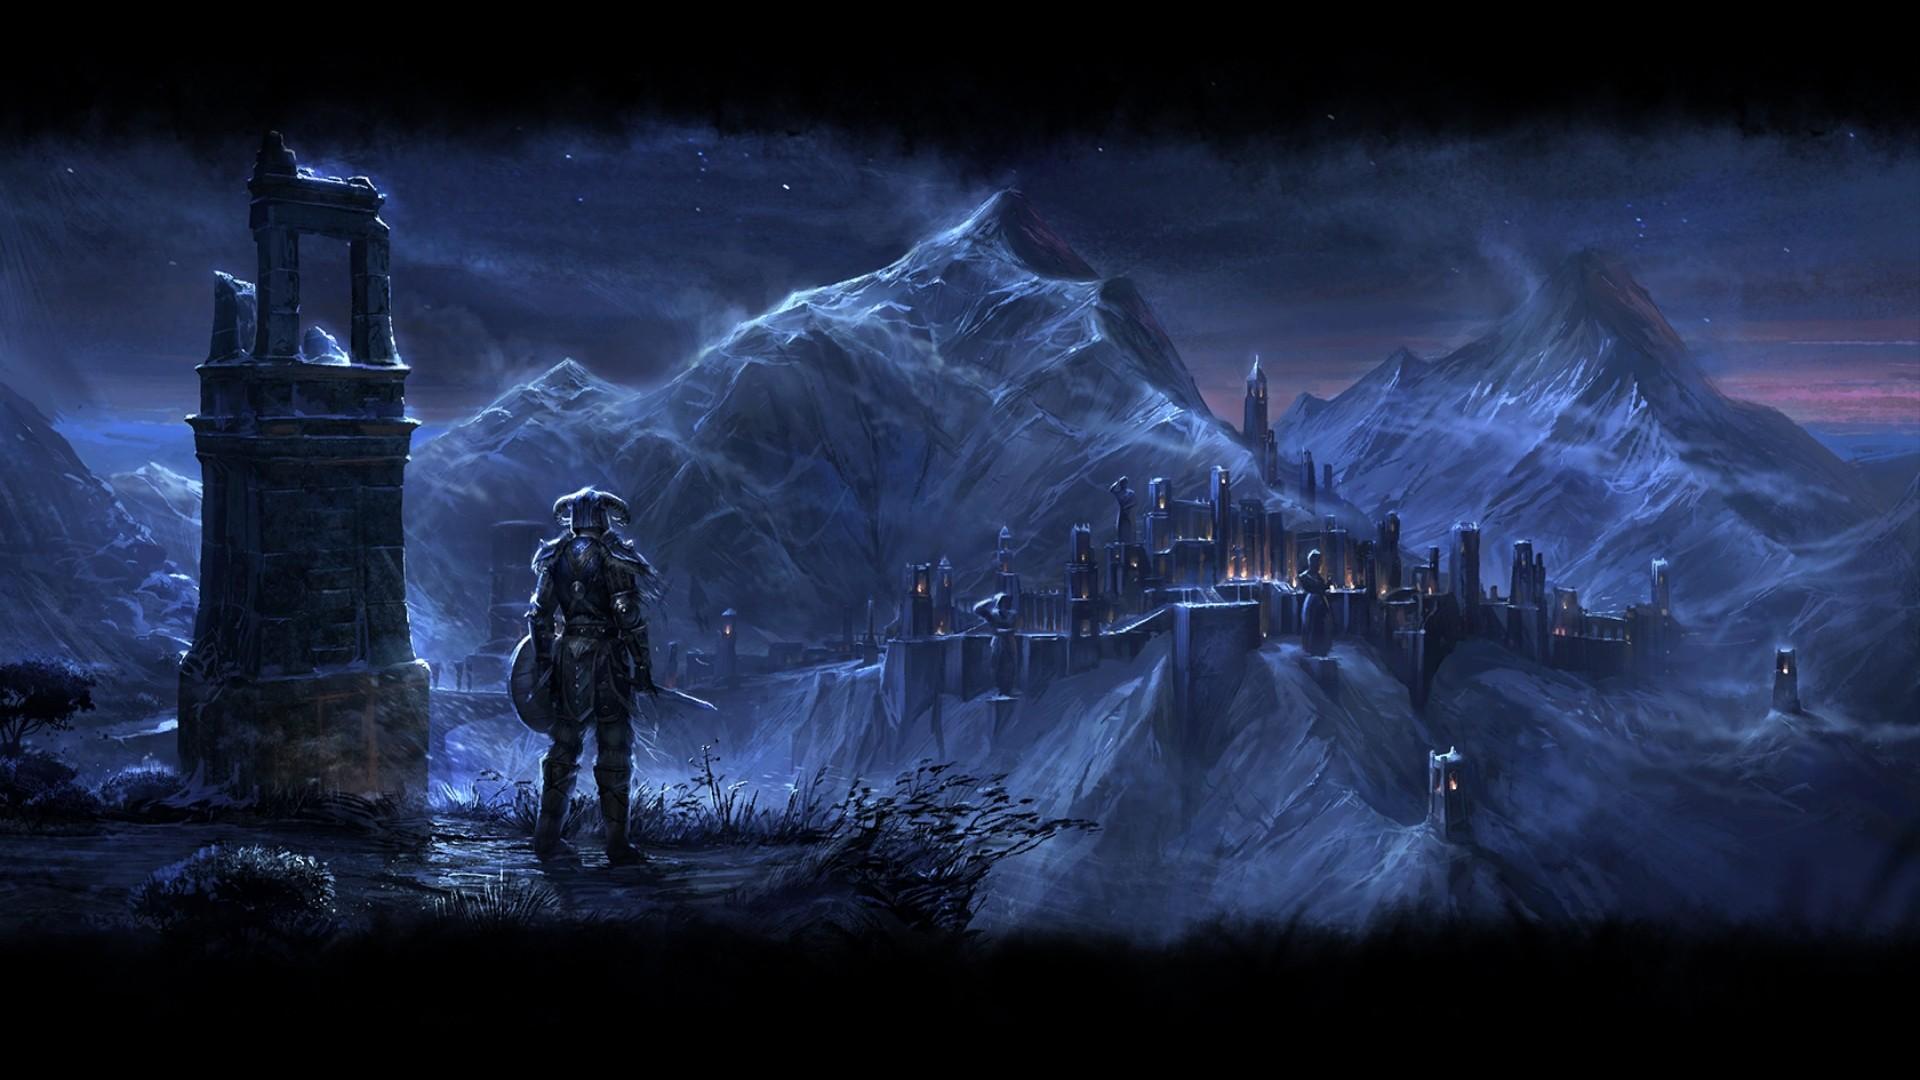 Elder Scrolls Wallpaper and Background